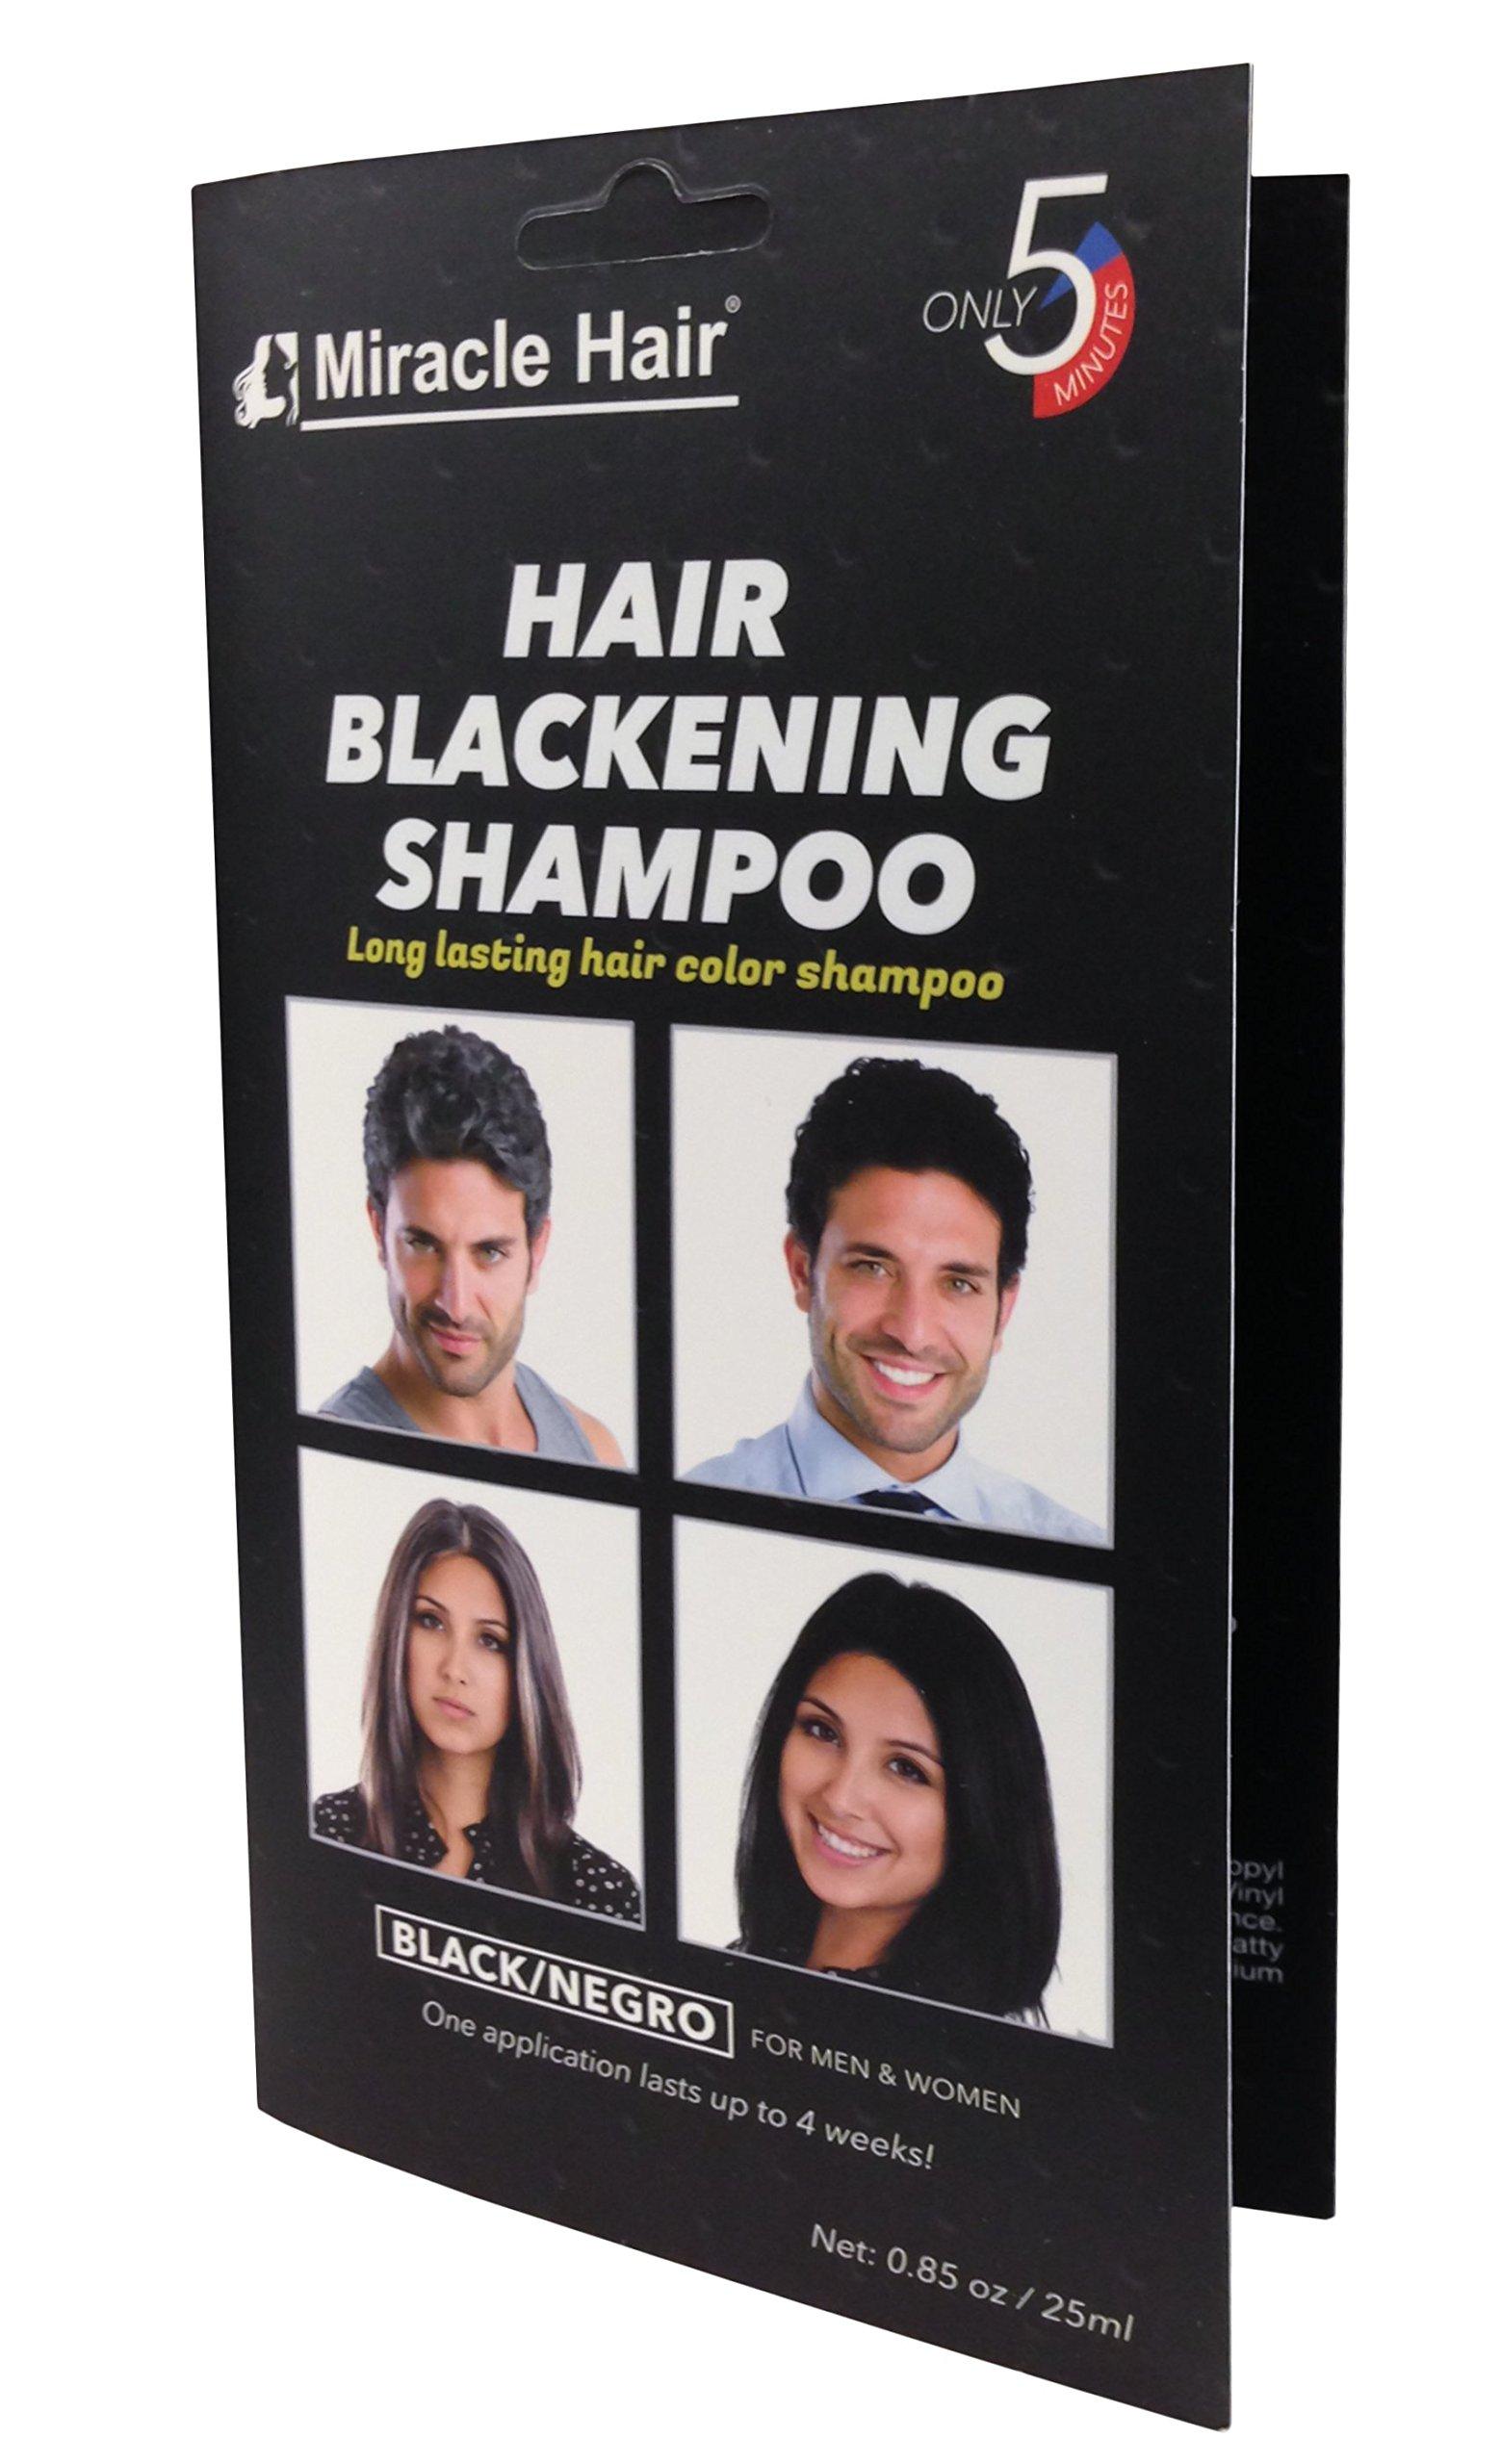 Amazon.com : Instant Hair Dye - Black Hair Shampoo - (3 ...